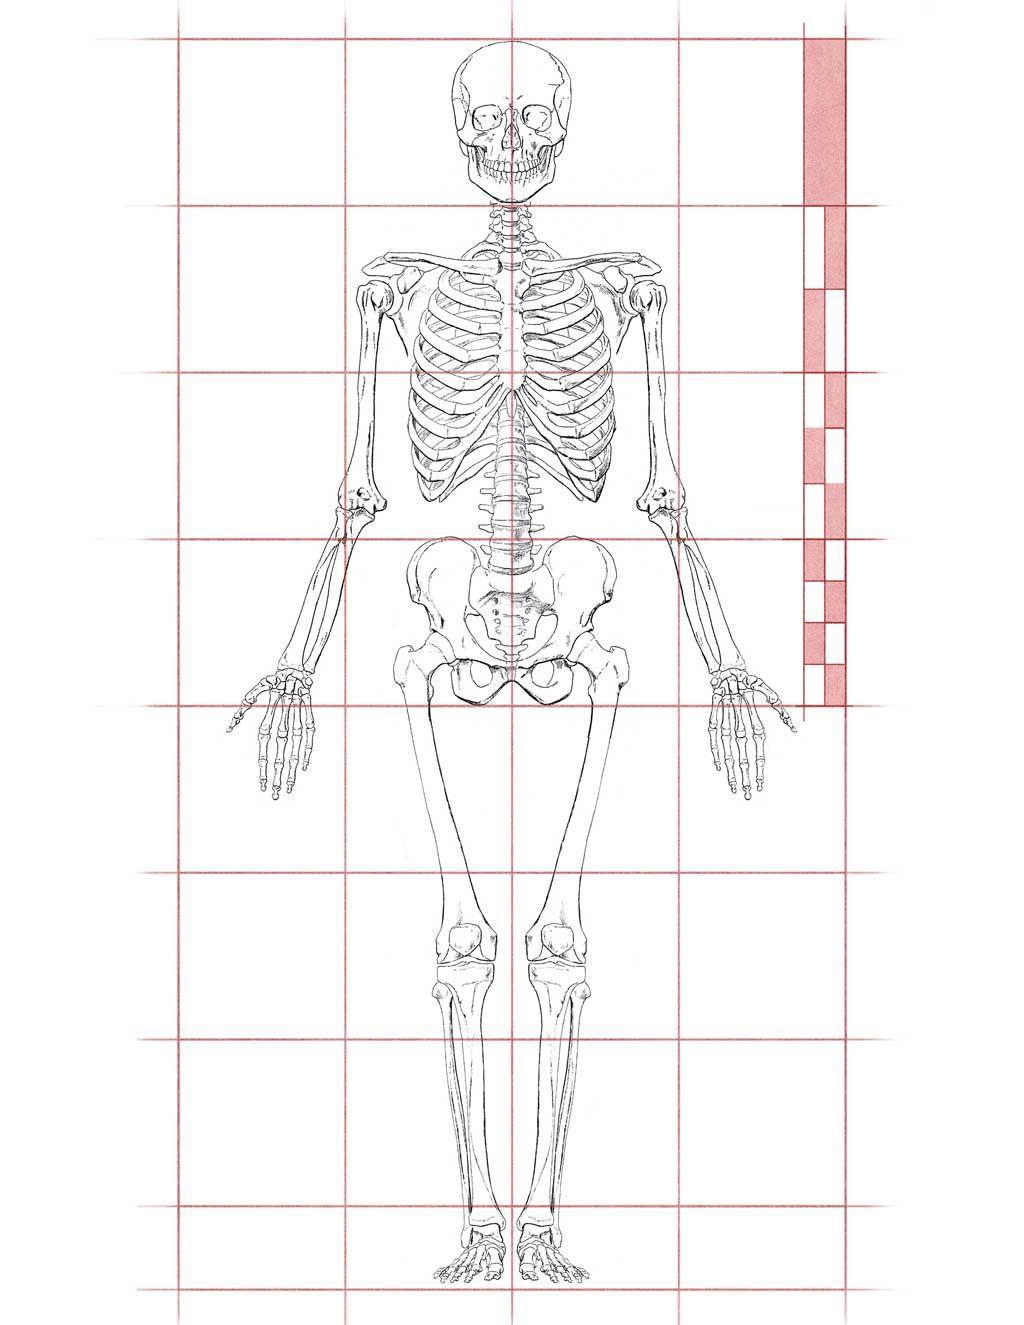 small resolution of artistic anatomy dr paul richer skeletal study 7 1 2 head proportion study artstudy artanatomy humanproportion proportion skeleton hartman